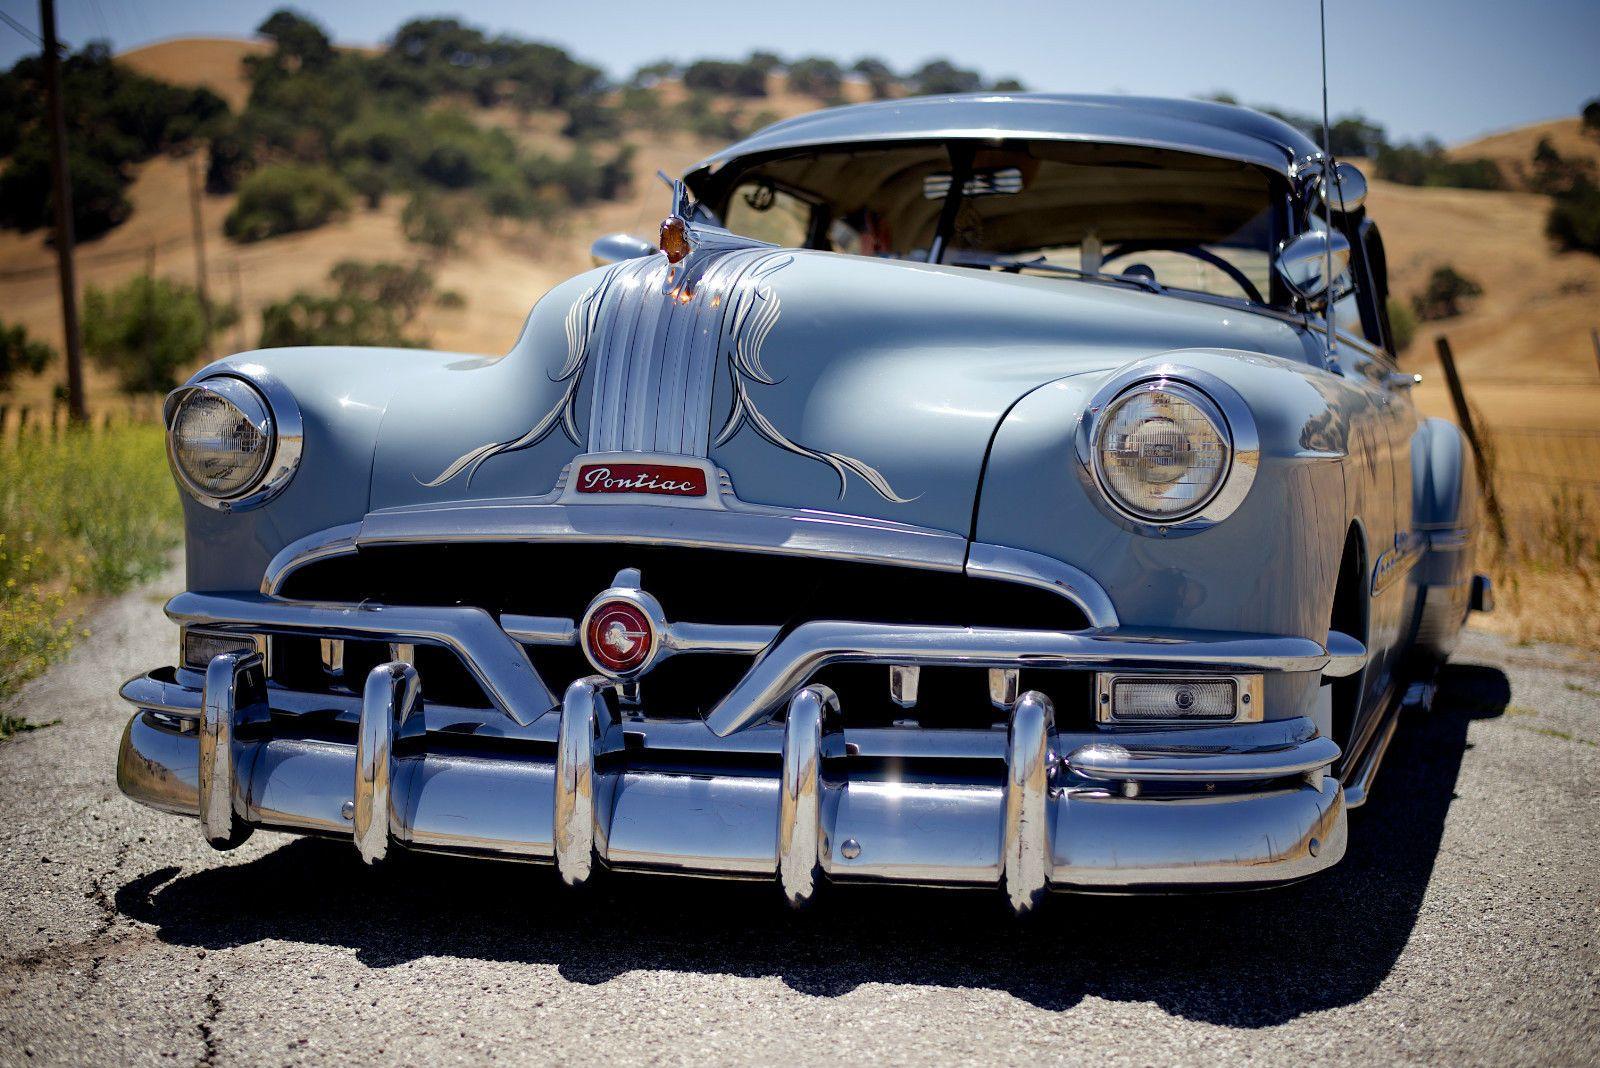 1951 Pontiac Coupe For Sale: 1951 Pontiac Chieftain 2-door Coupe Custom